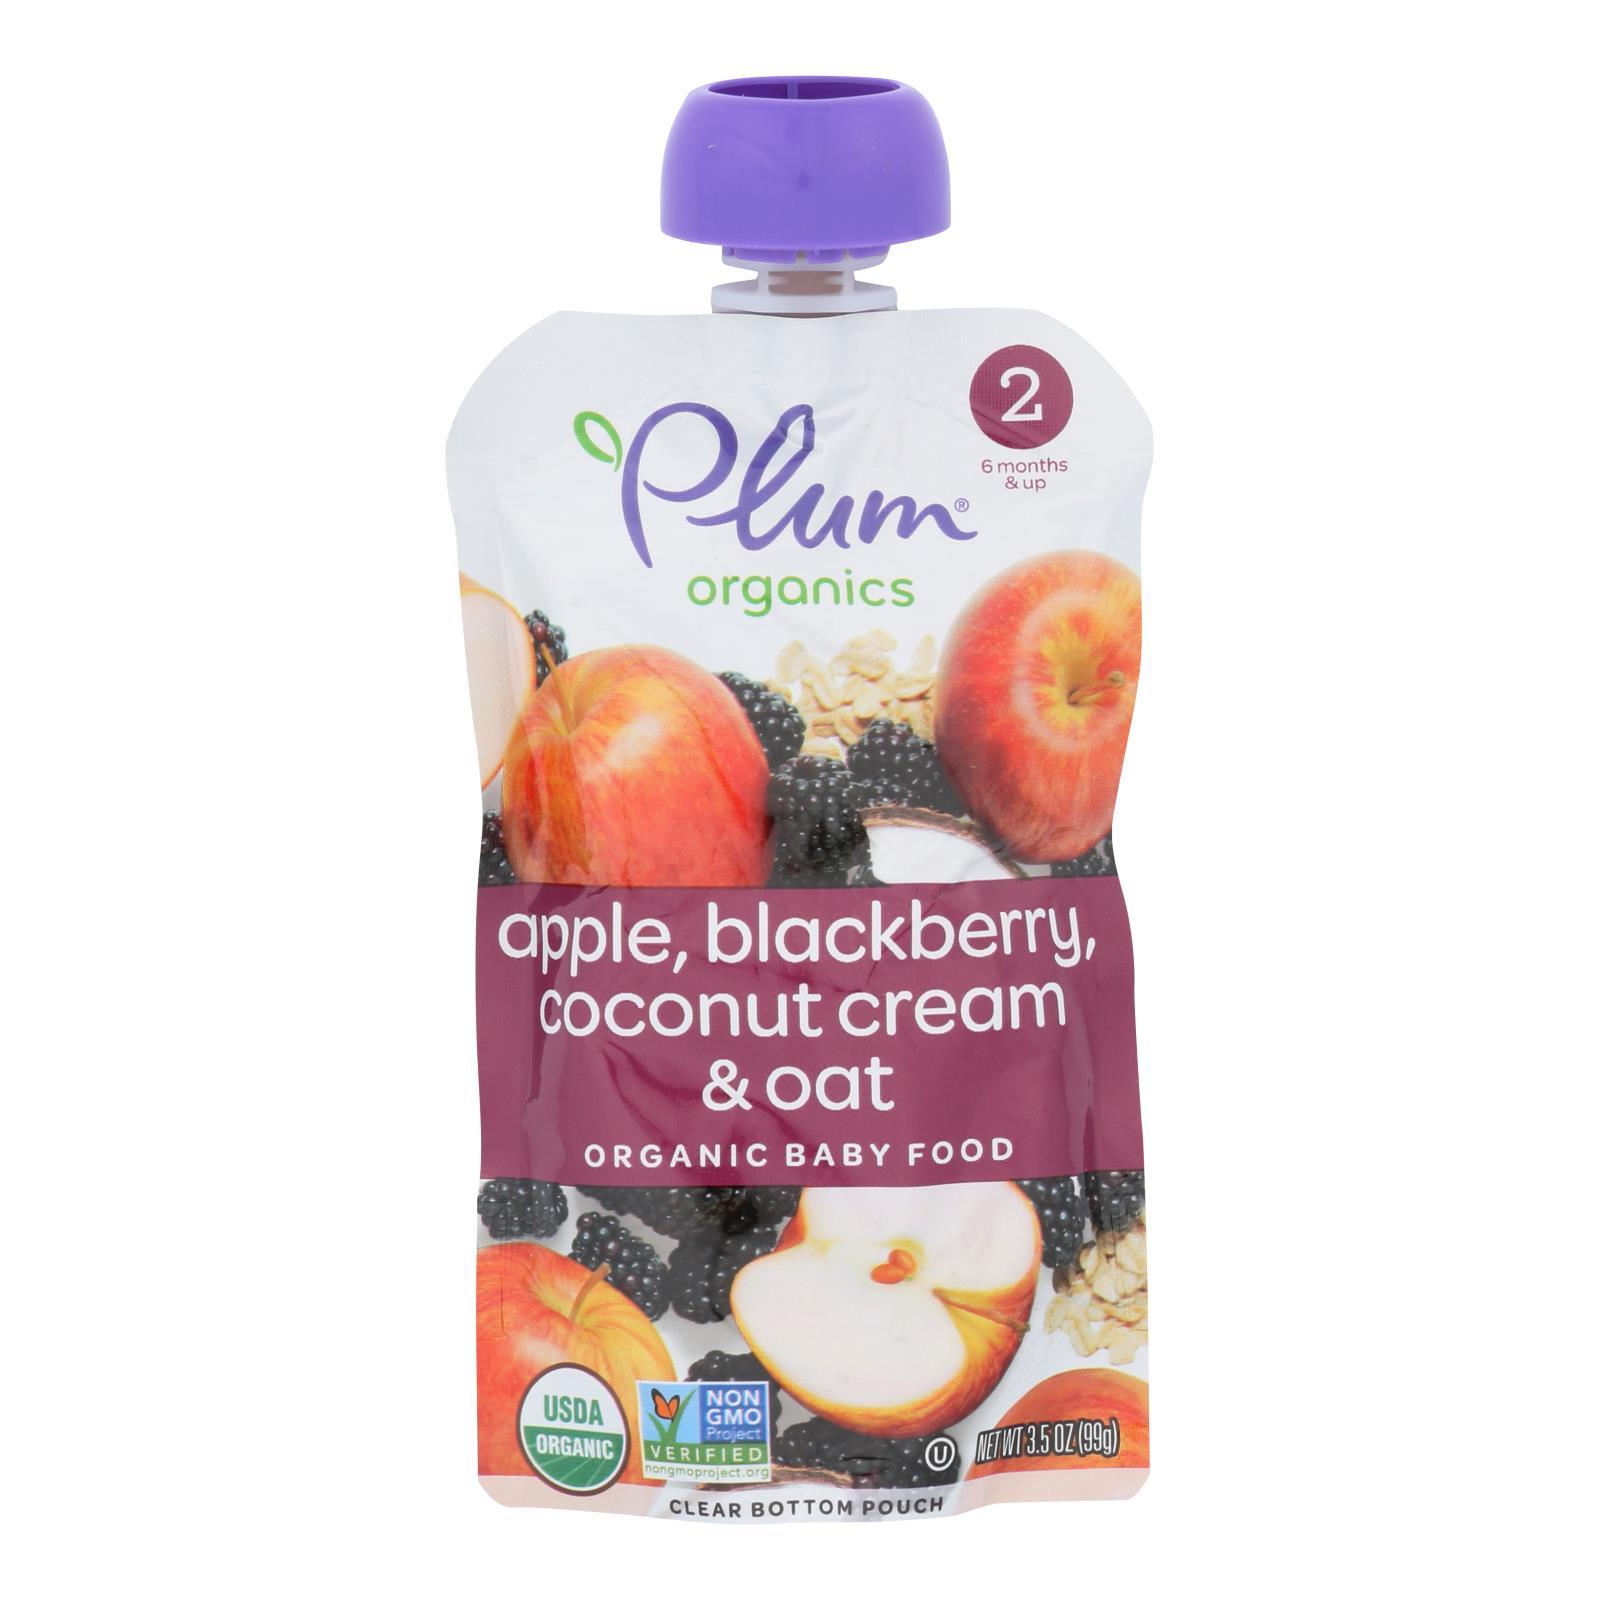 Plum Organics Plum Stage2 Blends Baby Food Apple Blackberry Coconut - Case of 6 - 3.5 OZ